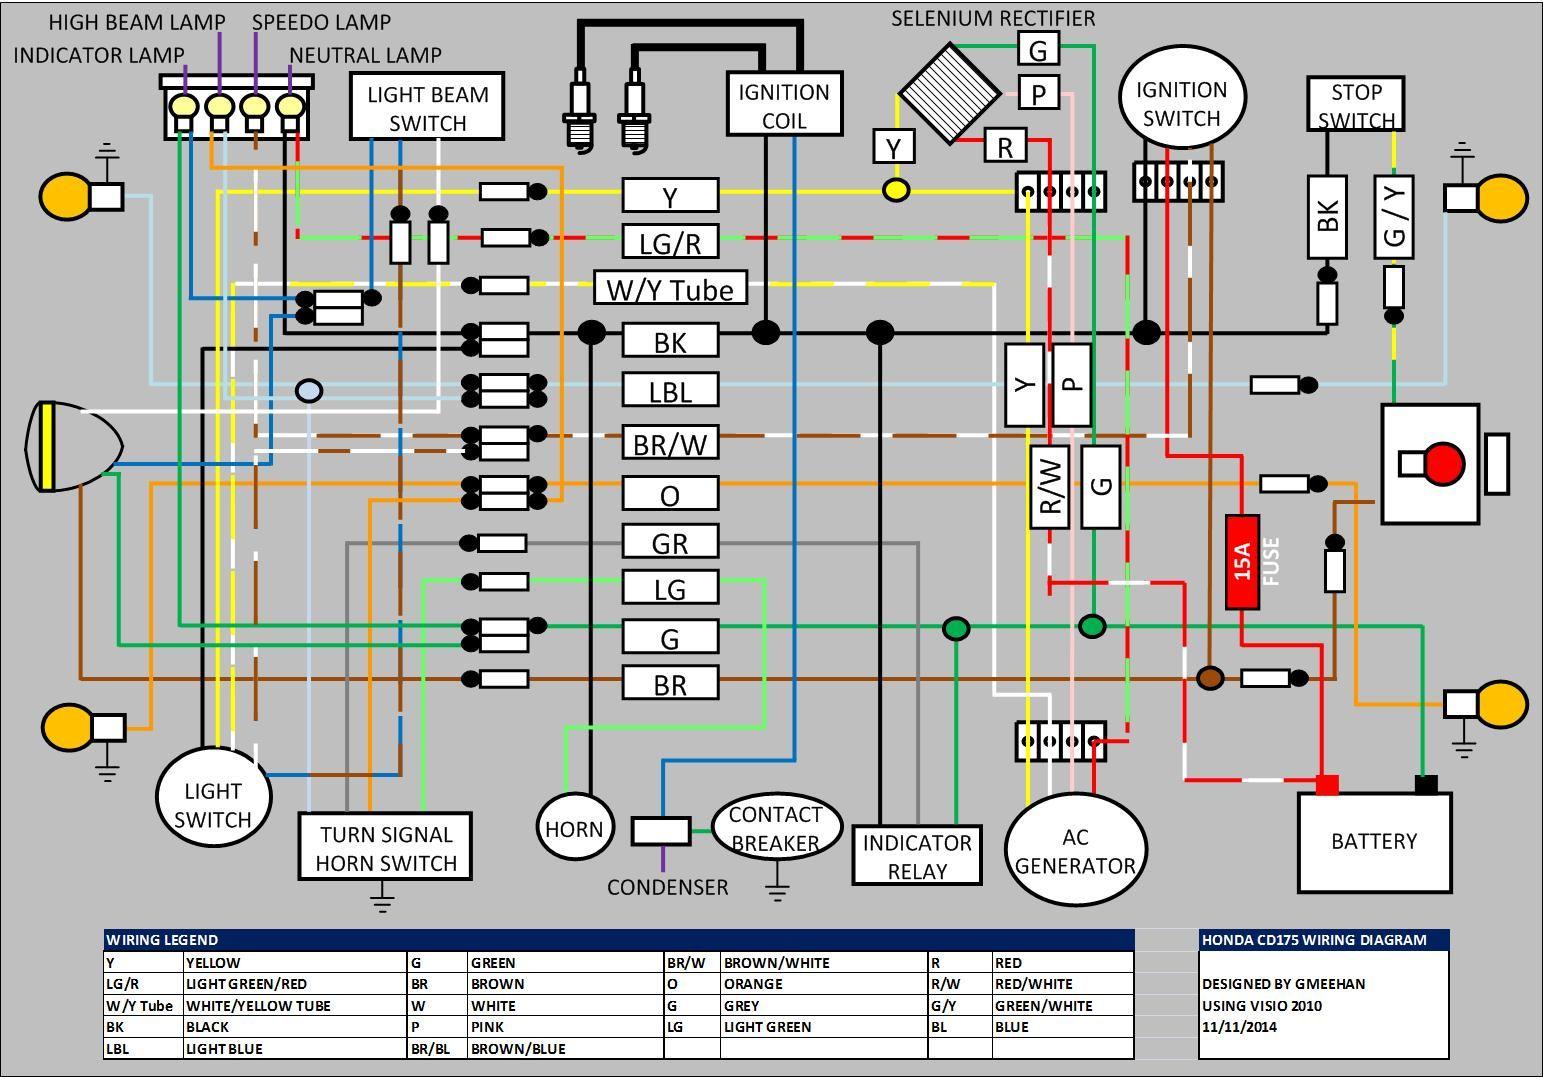 Inspiration Honda Wiring Diagram Honda 100 Atv Wiring Schematic Diagram Honda Wiring Diagram Bo In 2020 Electrical Wiring Diagram Motorcycle Wiring Electrical Diagram